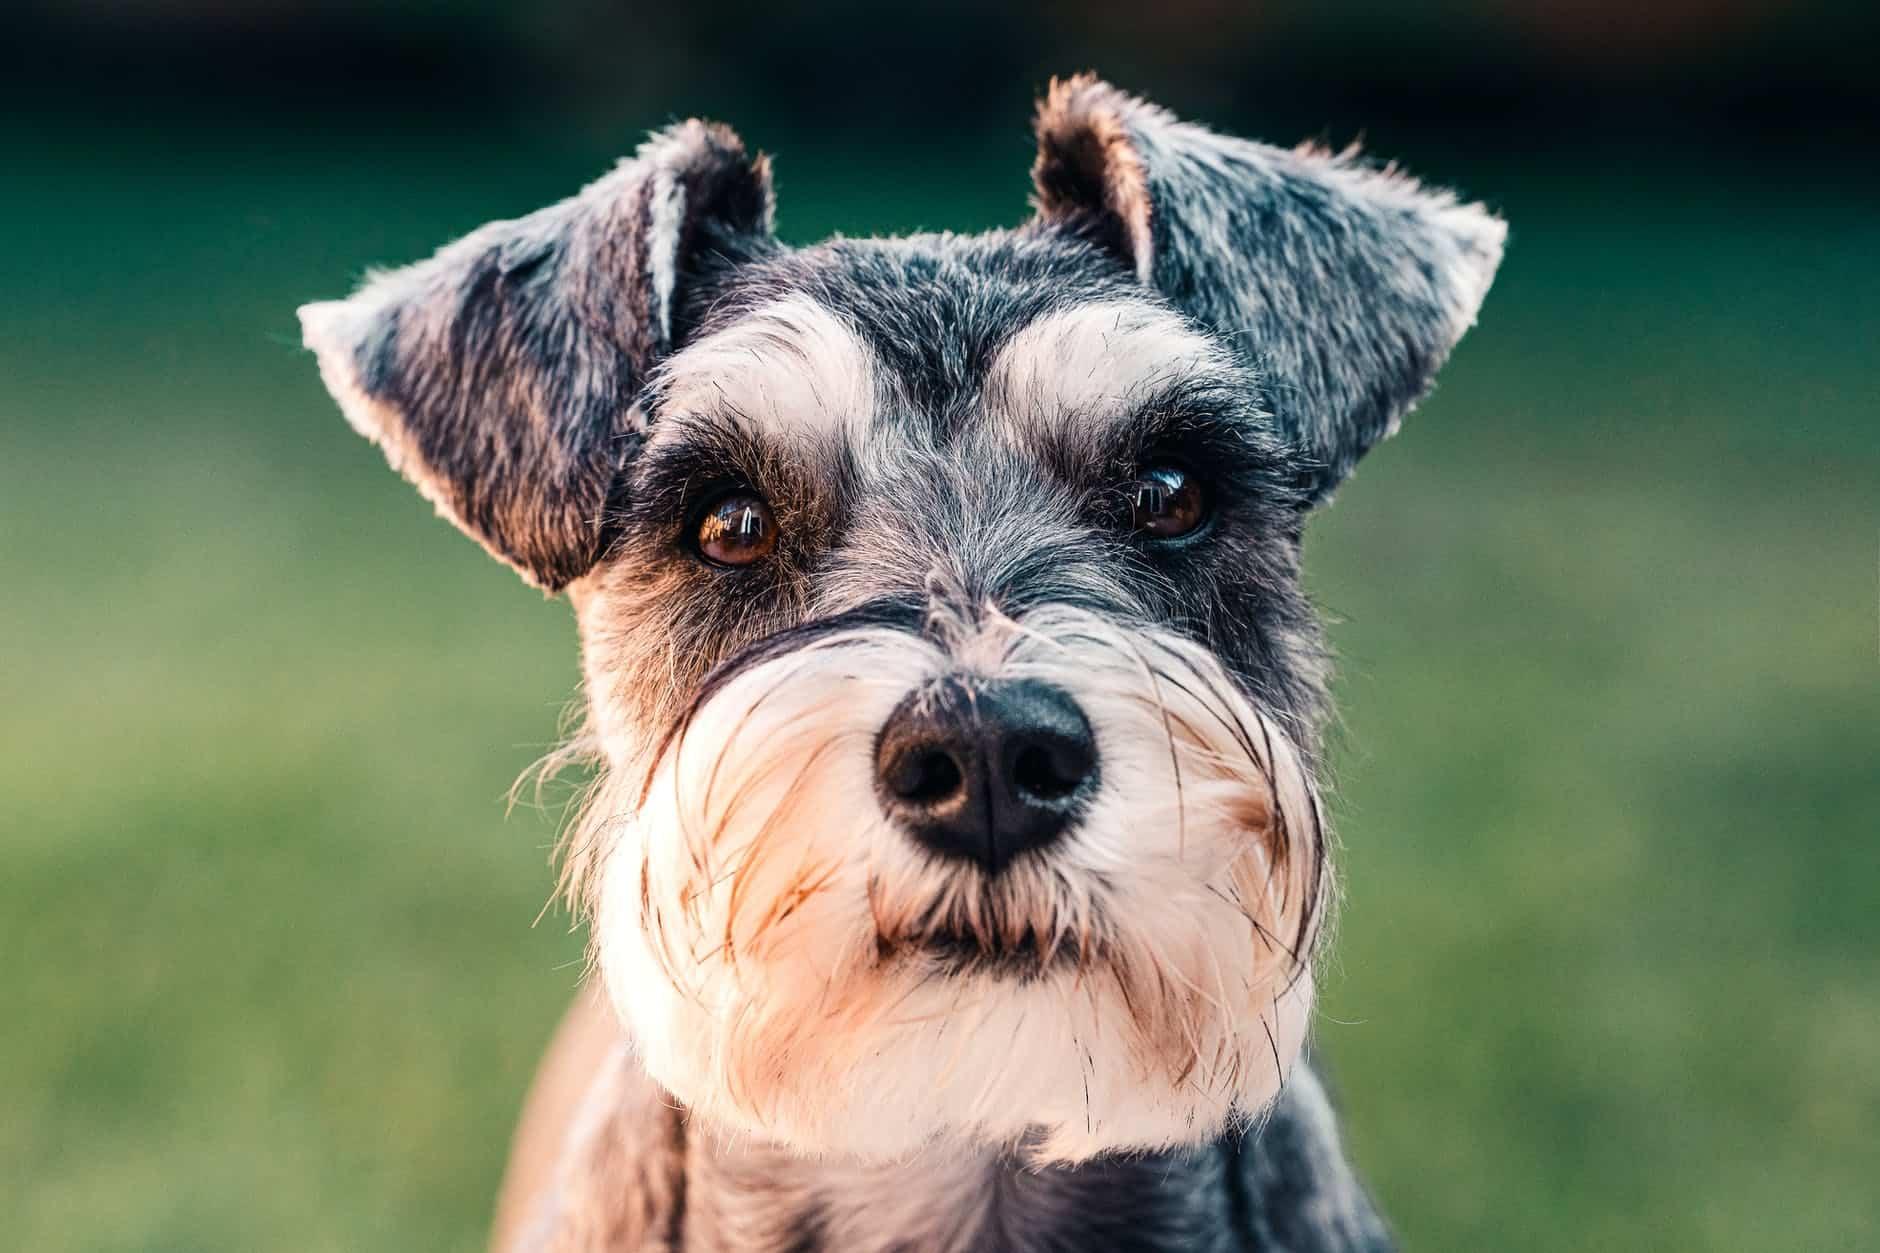 black and white long coated small sized dog